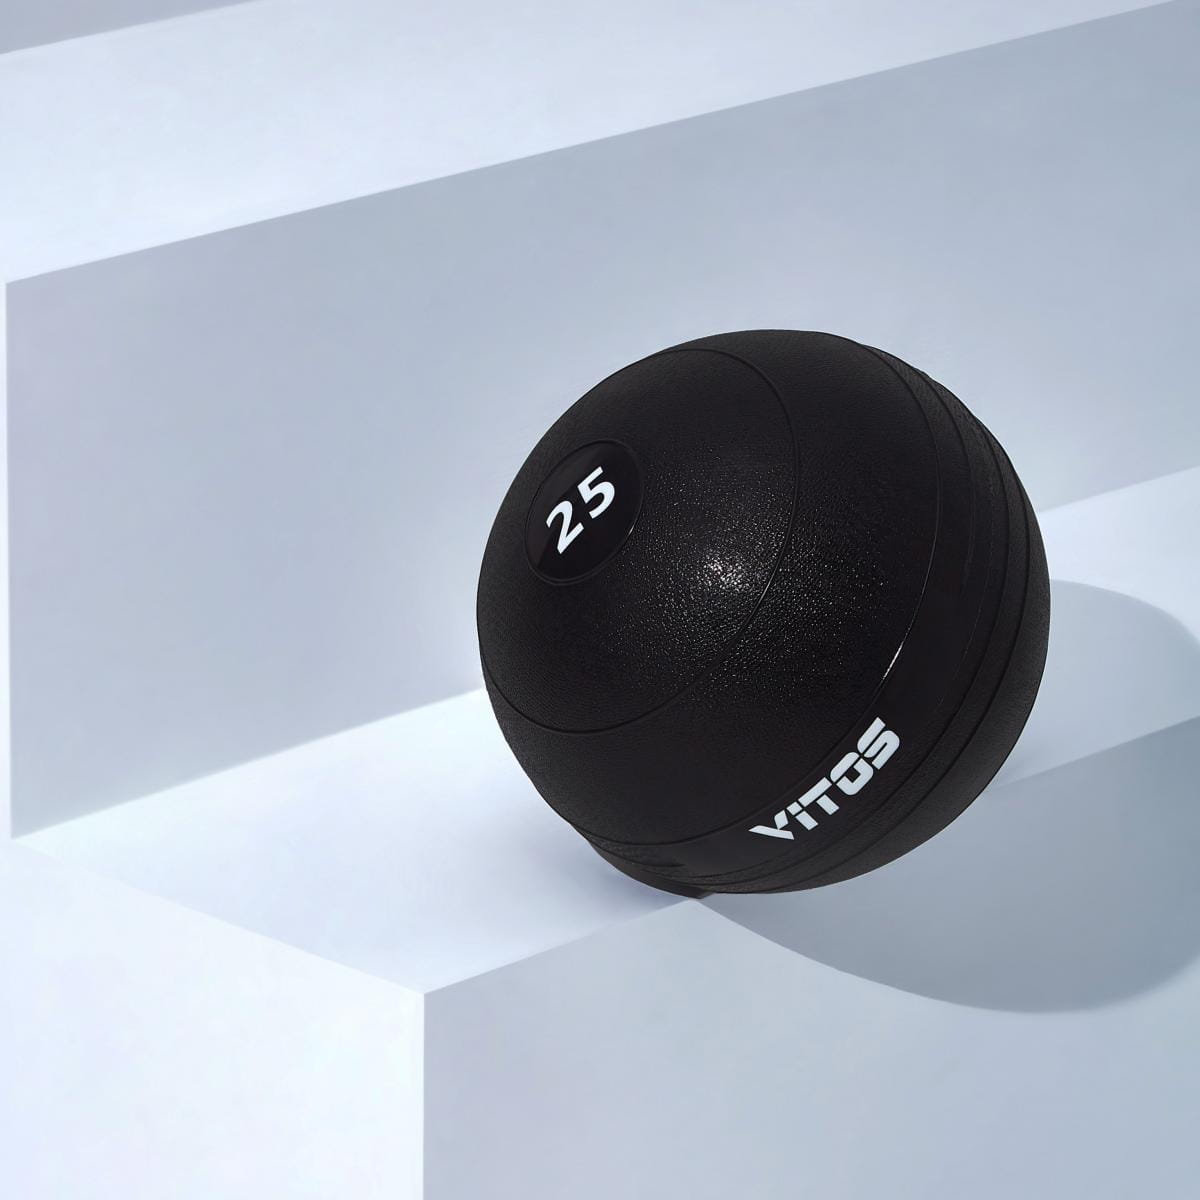 VITOS 重力球 45磅 20公斤 1